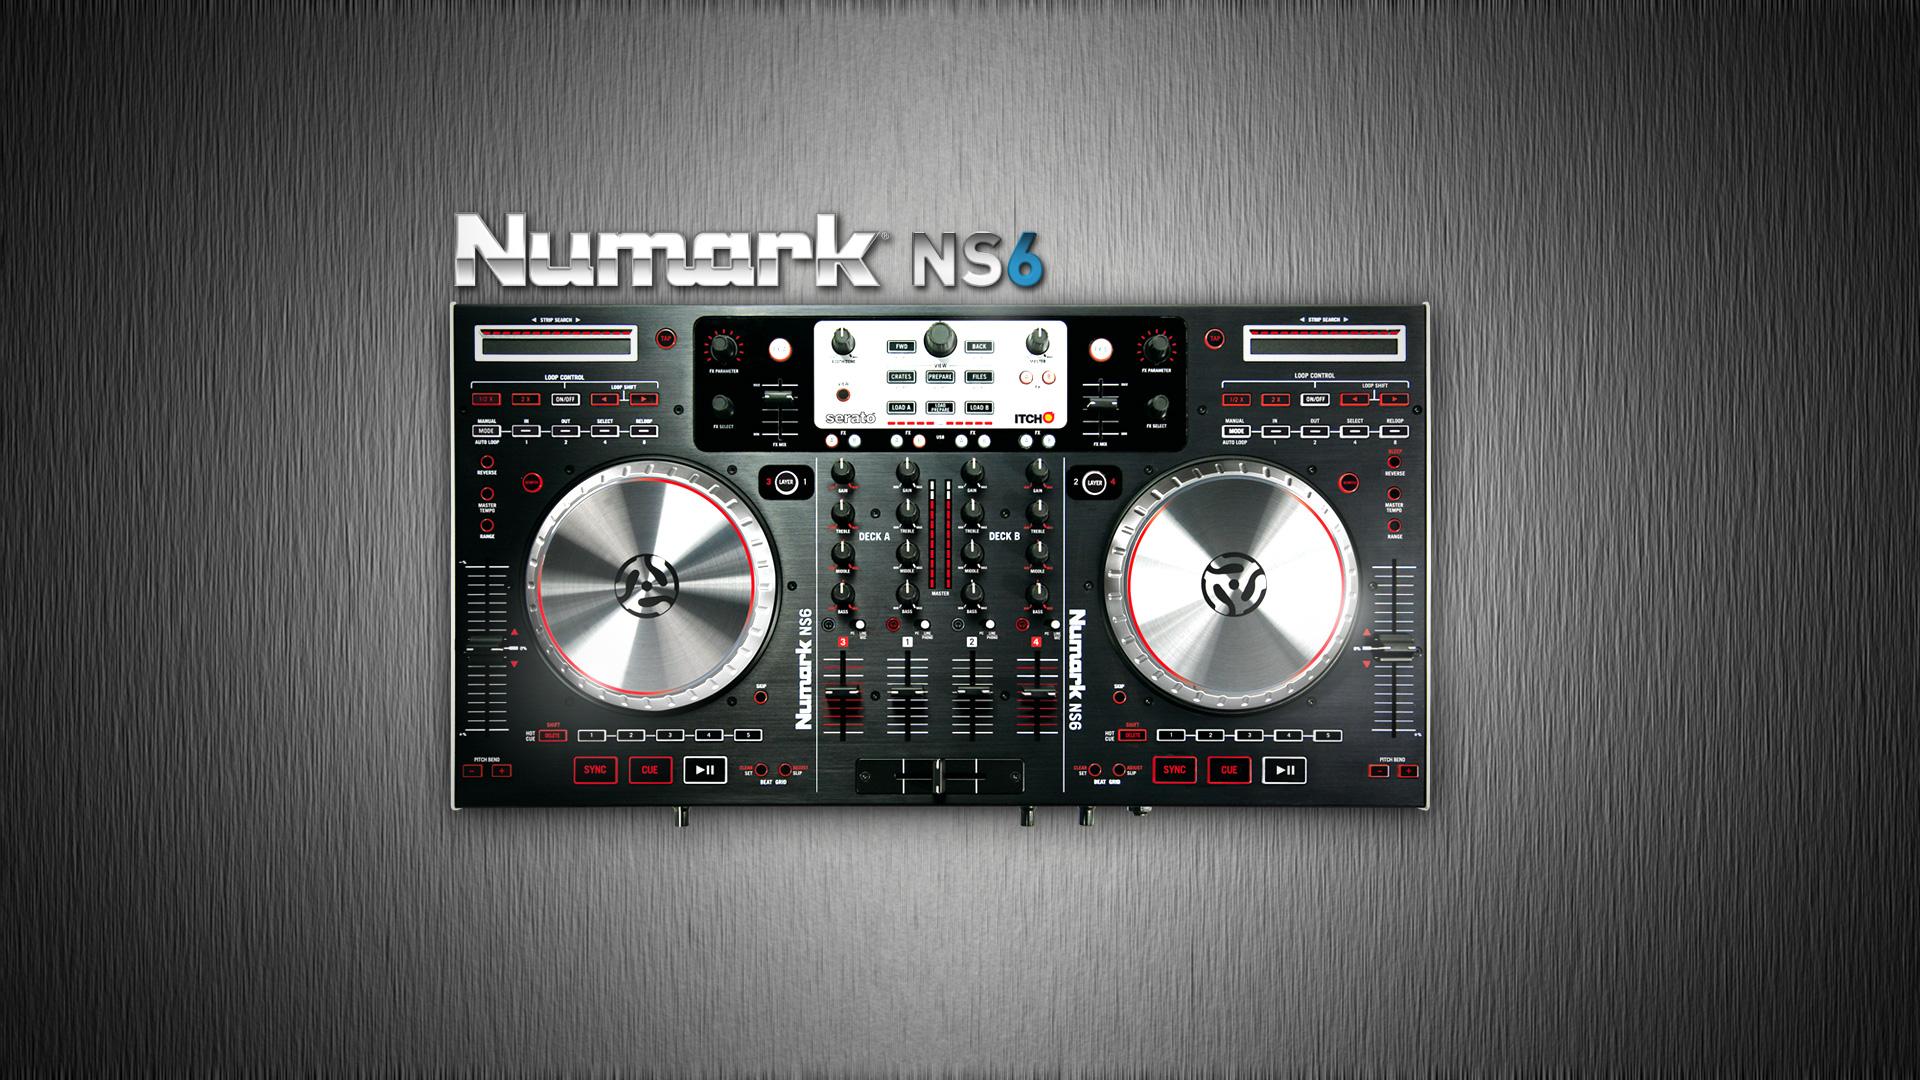 Numark Wallpaper - WallpaperSafari Numark Ns6 Wallpaper